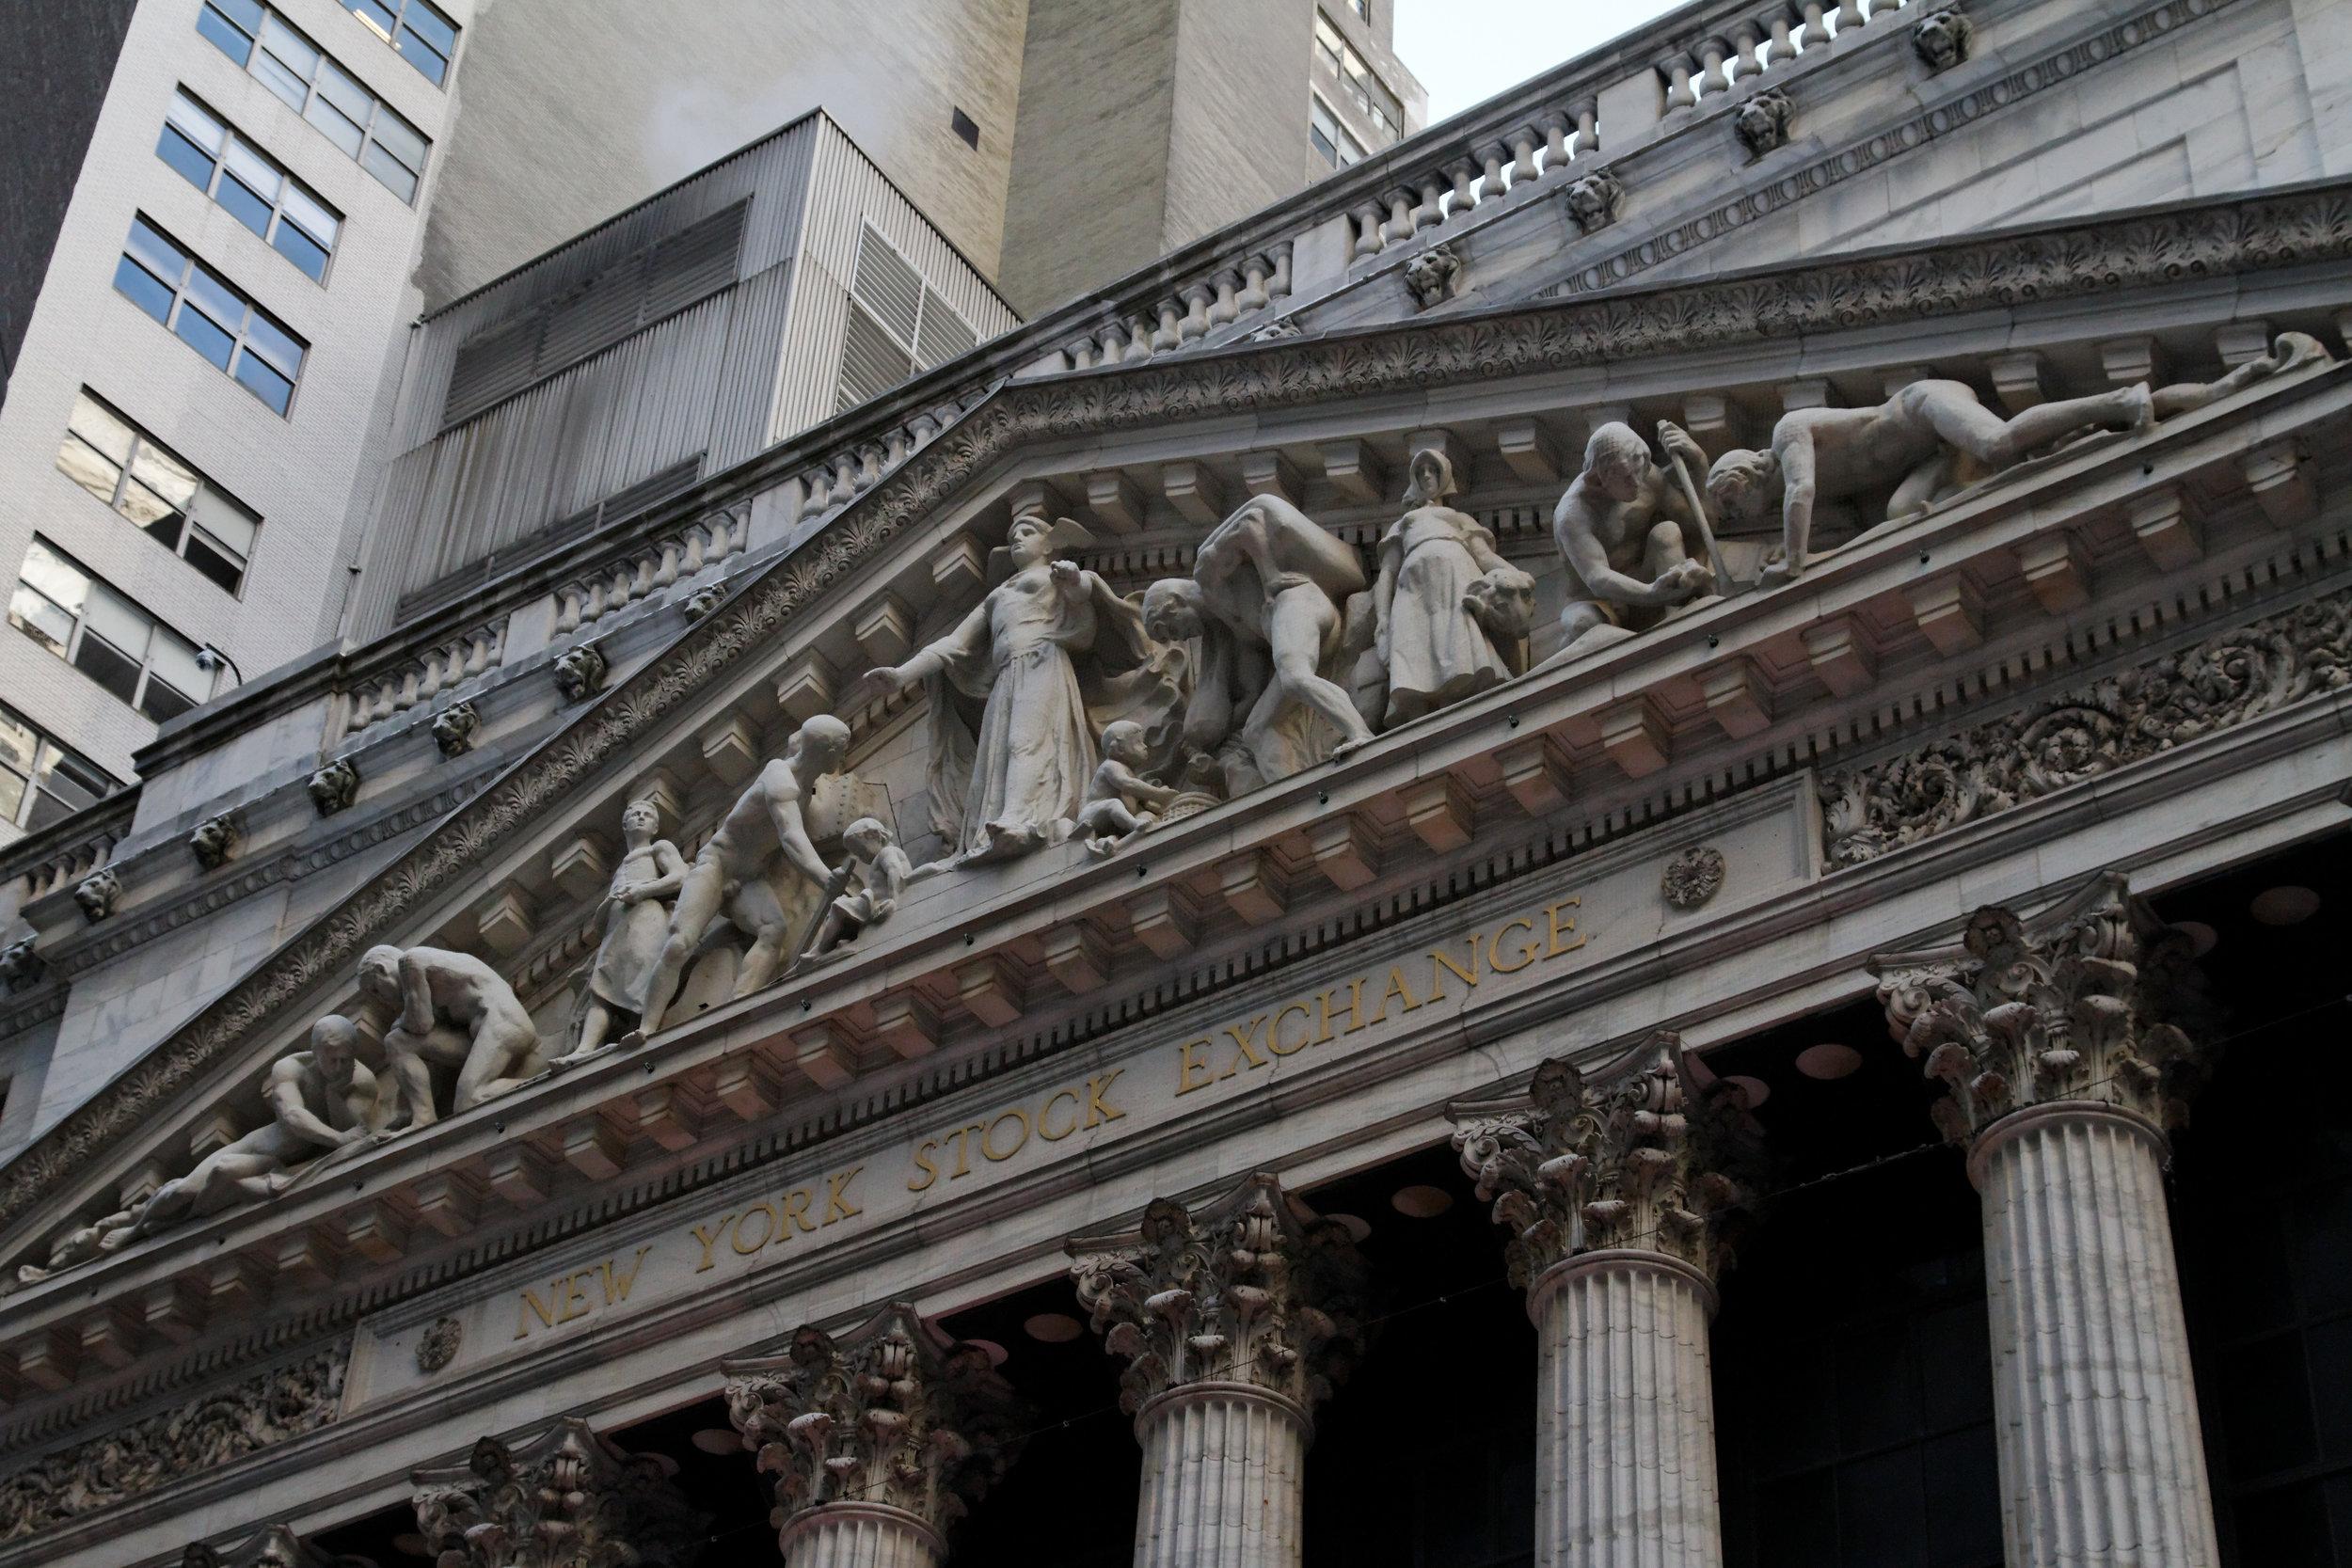 New_York_Stock_Exchange_4374520916.jpg